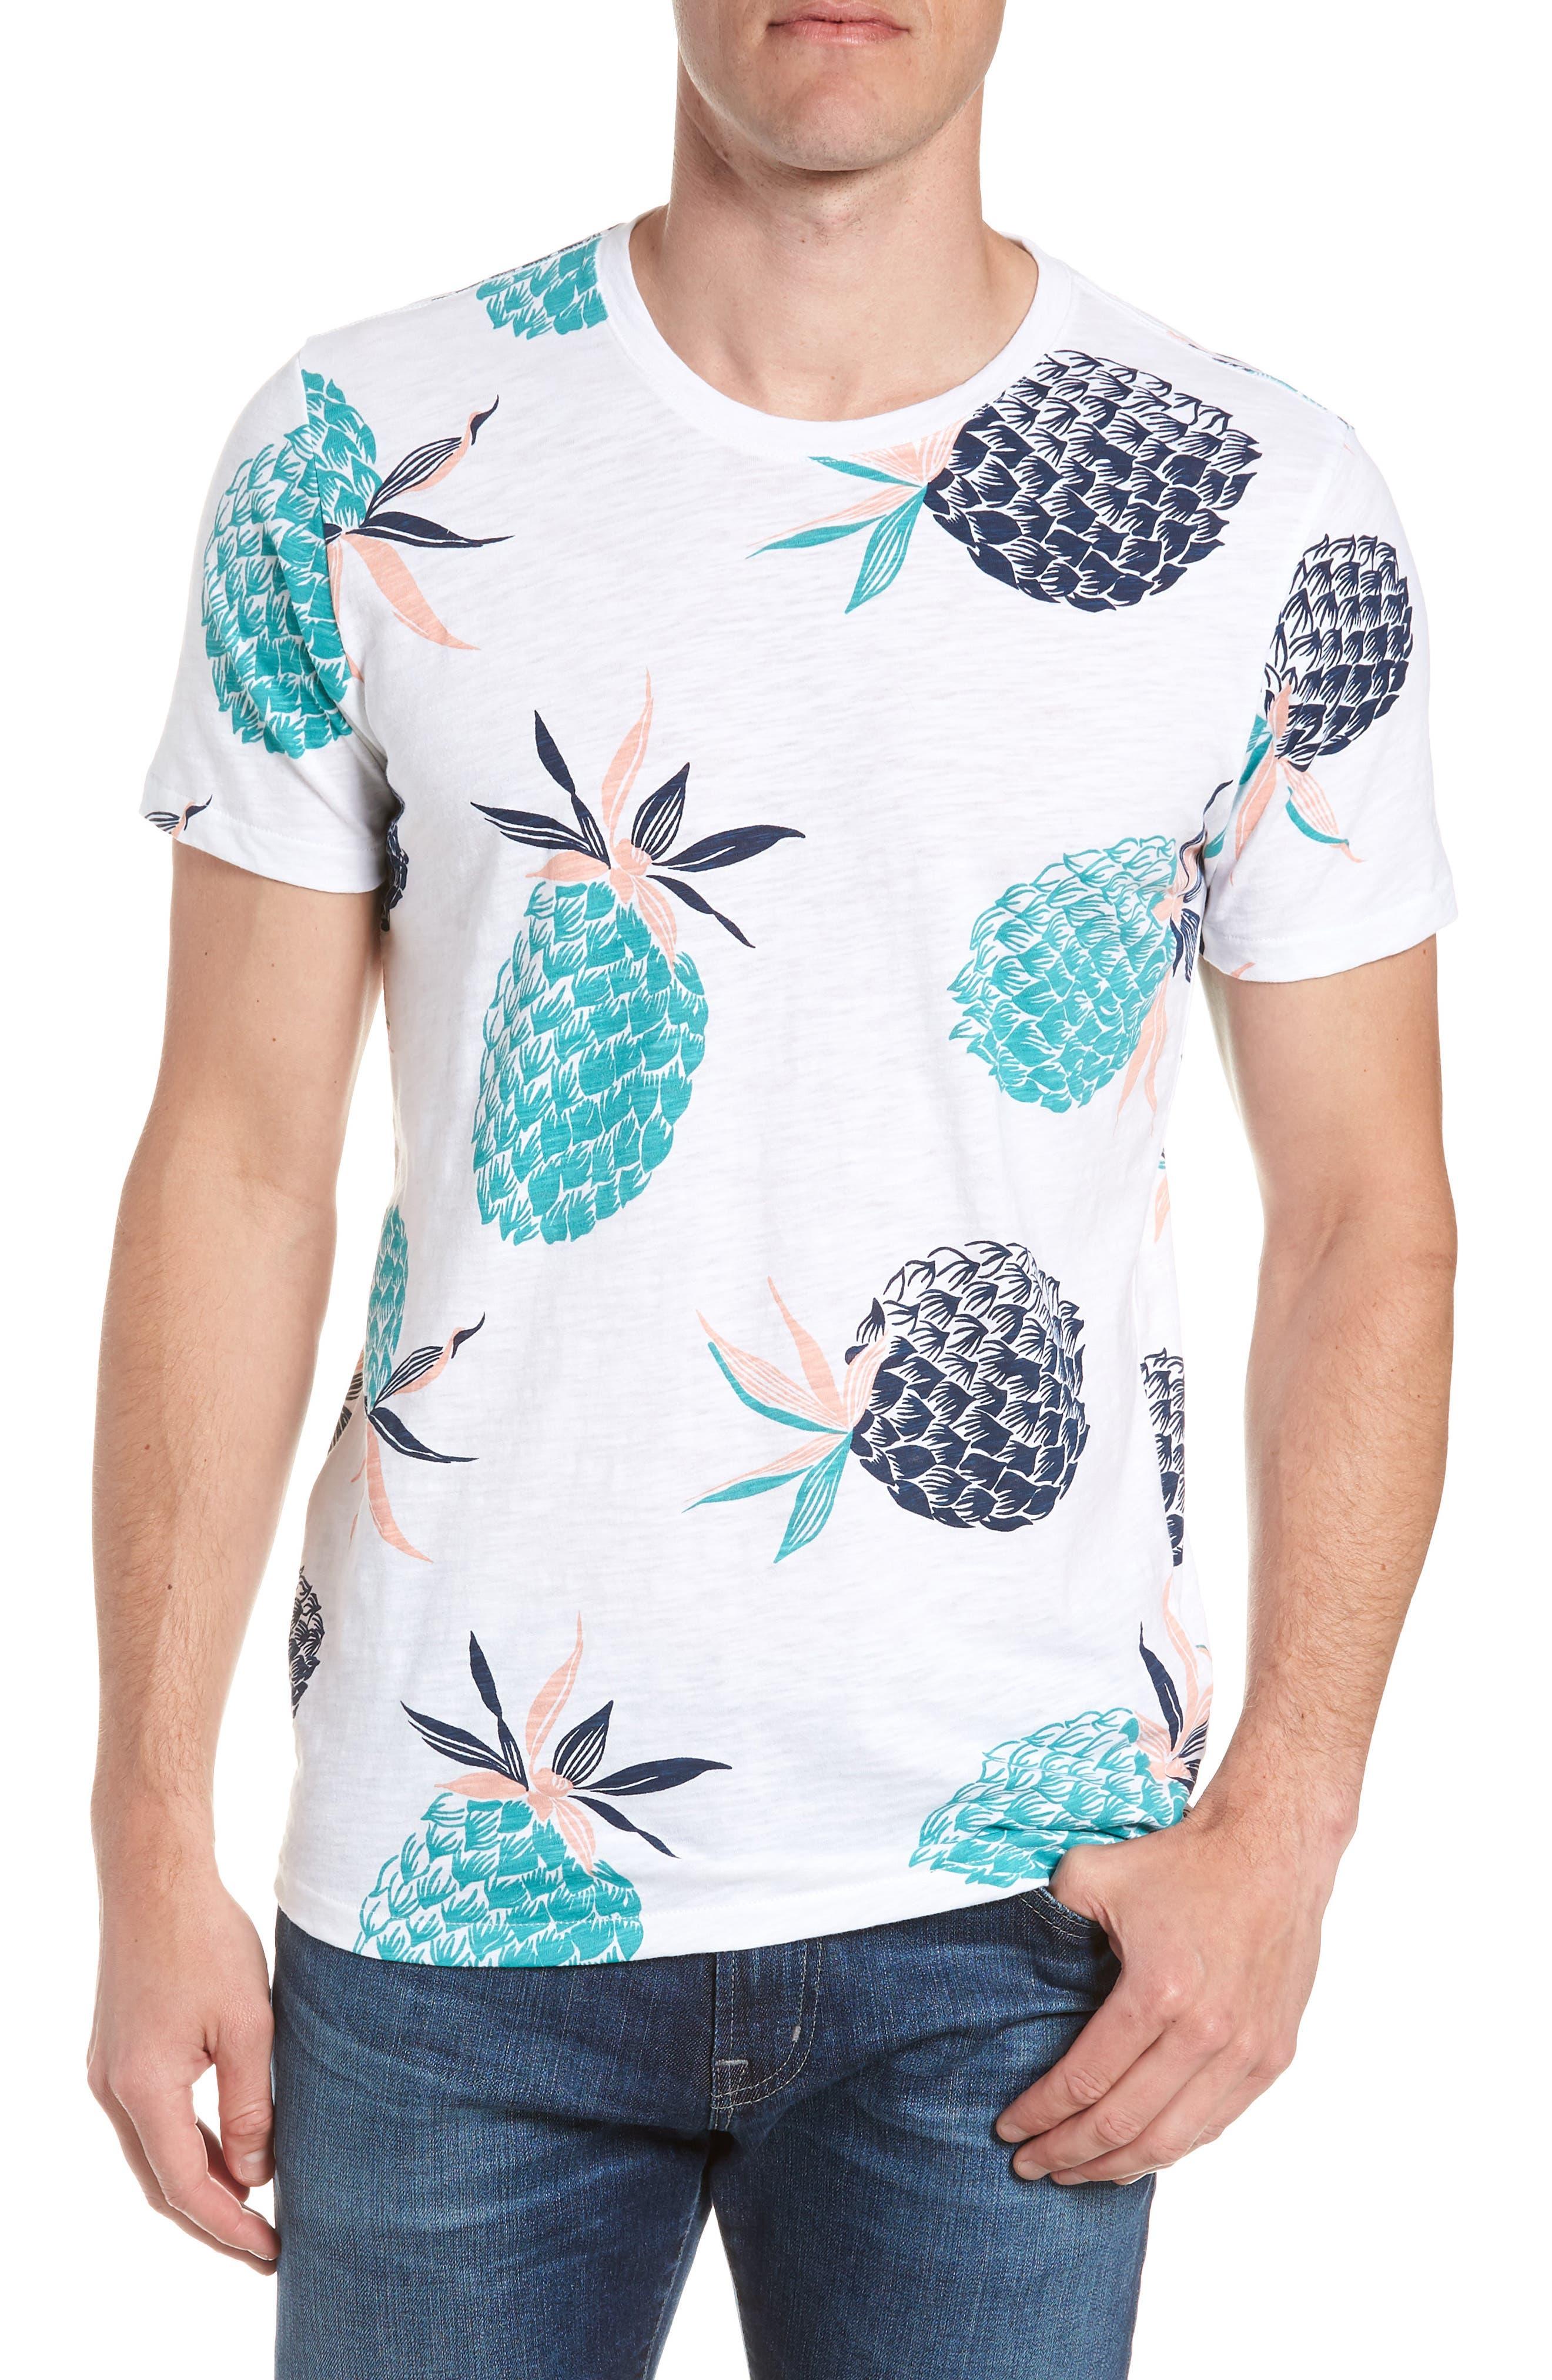 Pineapple Party Slim Fit T-Shirt,                         Main,                         color, White/ Latigo Bay/ Sorbet